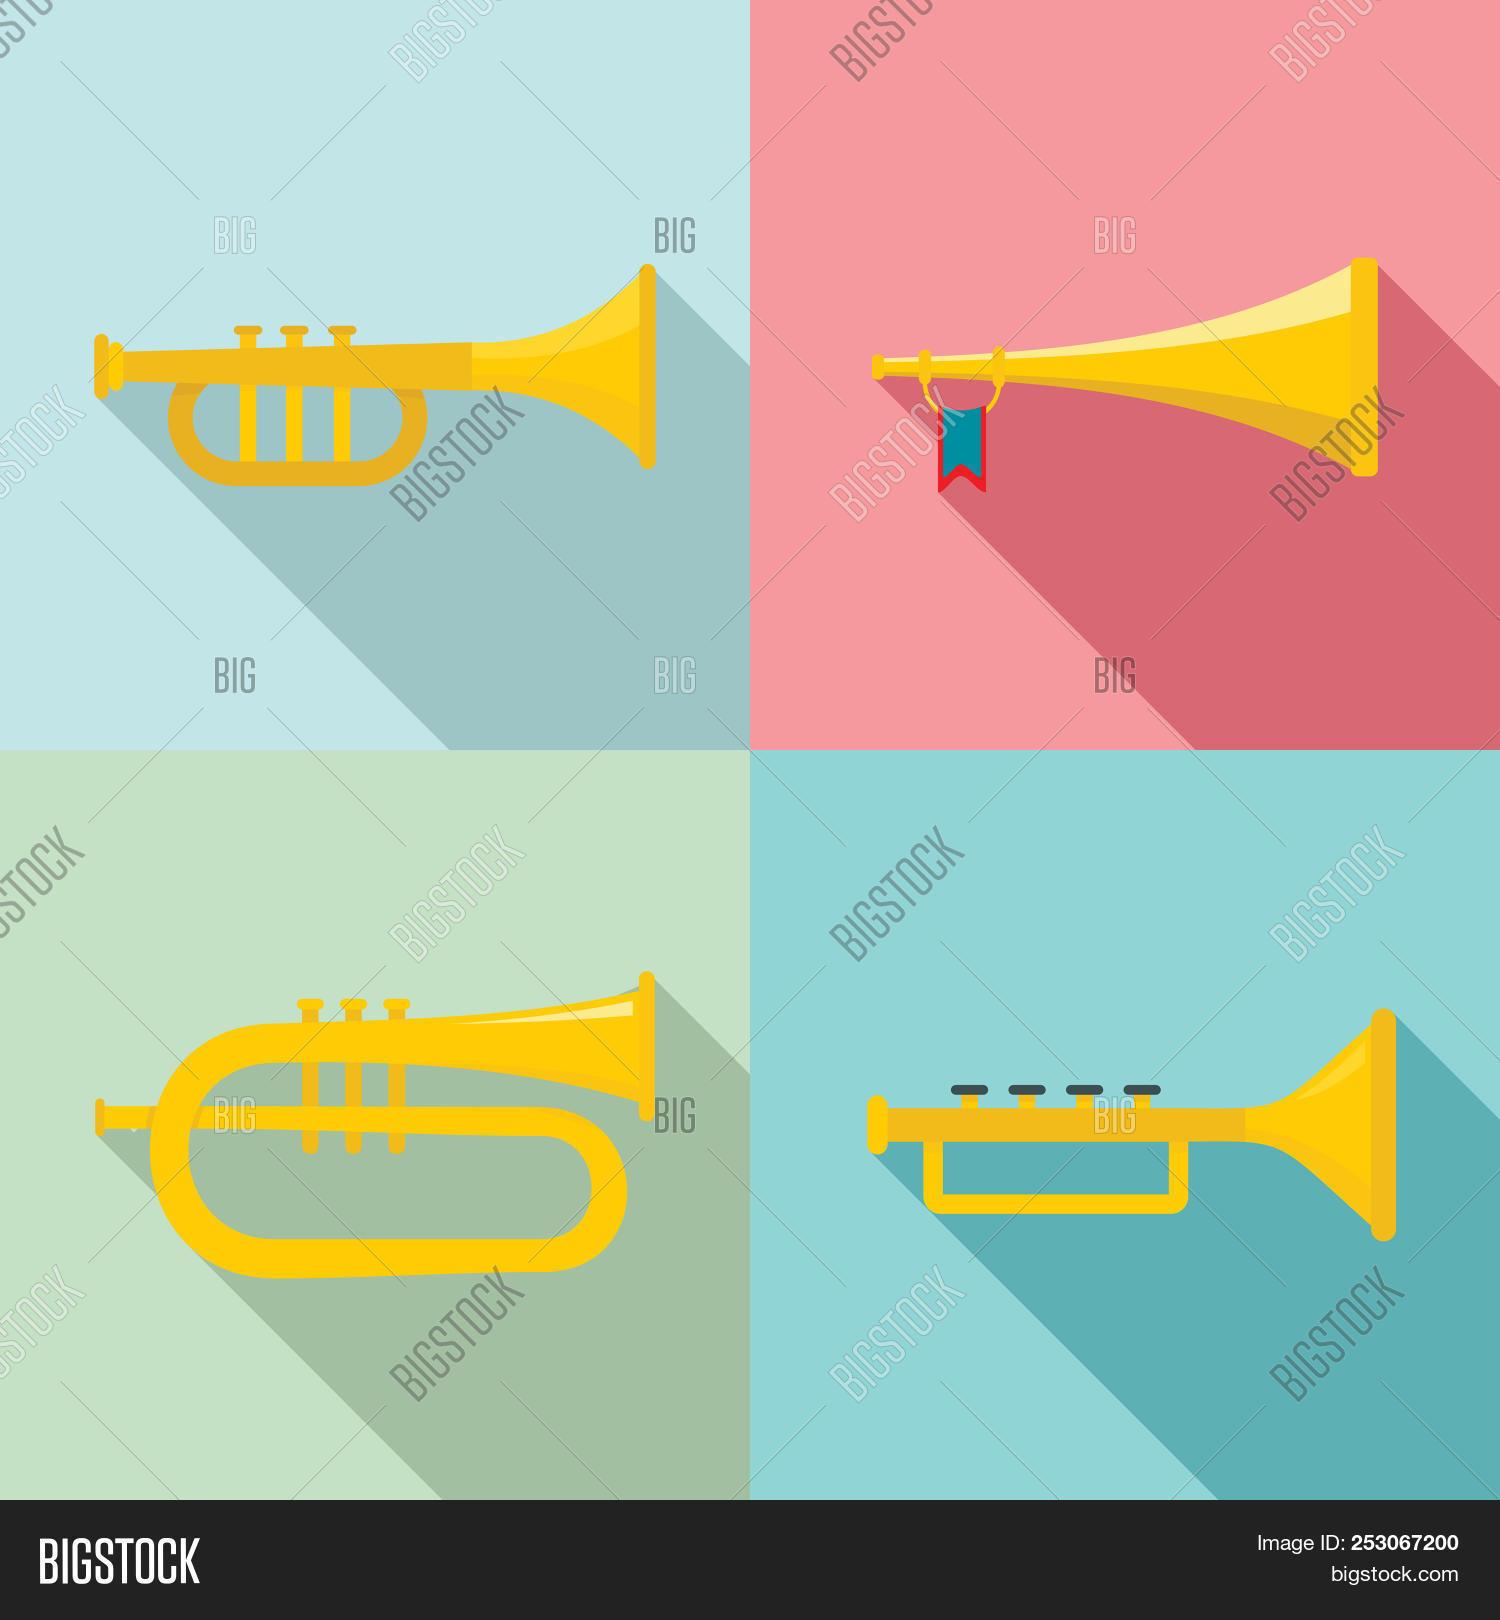 hight resolution of trumpet horn musical instrument icons set flat illustration of 4 trumpet horn musical instrument ic